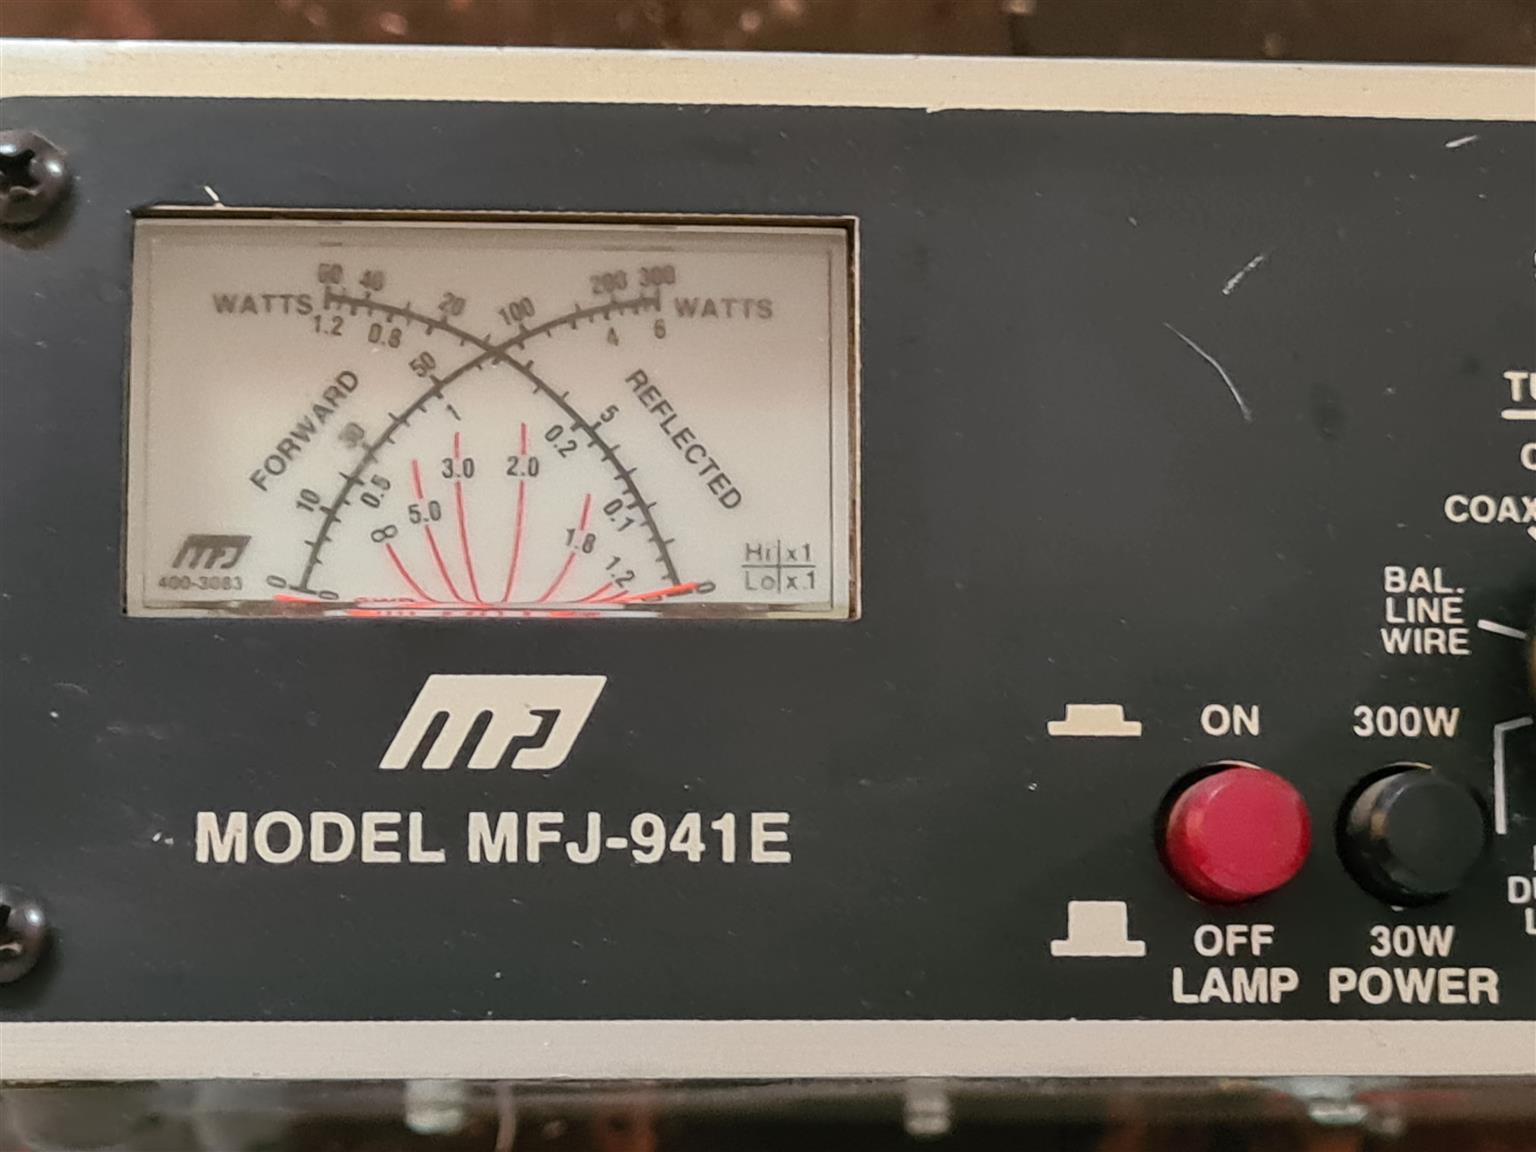 MFJ-941E, TUNER, HF, 300 WATTS, WITH MINI CROSS METER